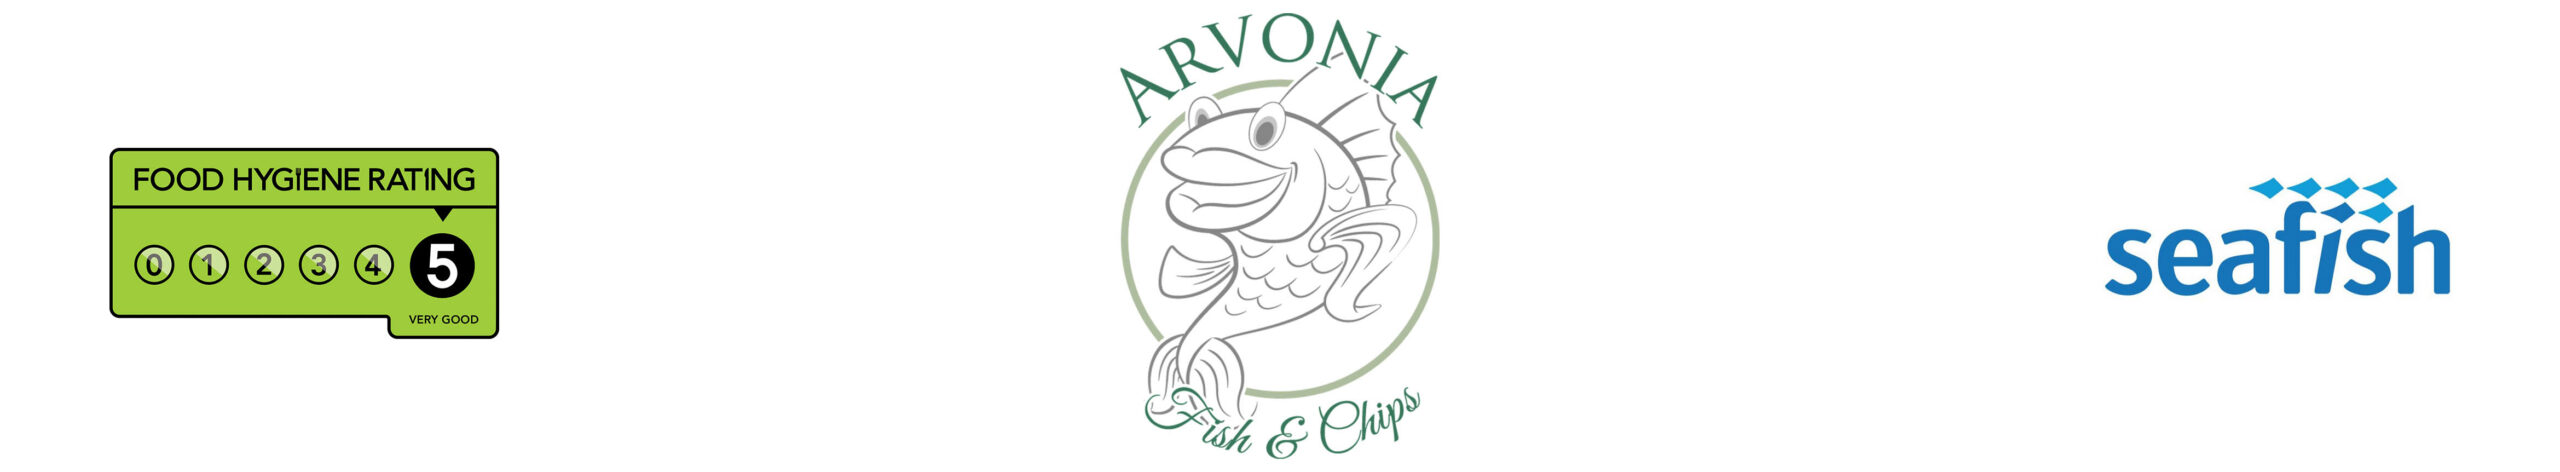 Arvonia Fish & Chips Logo